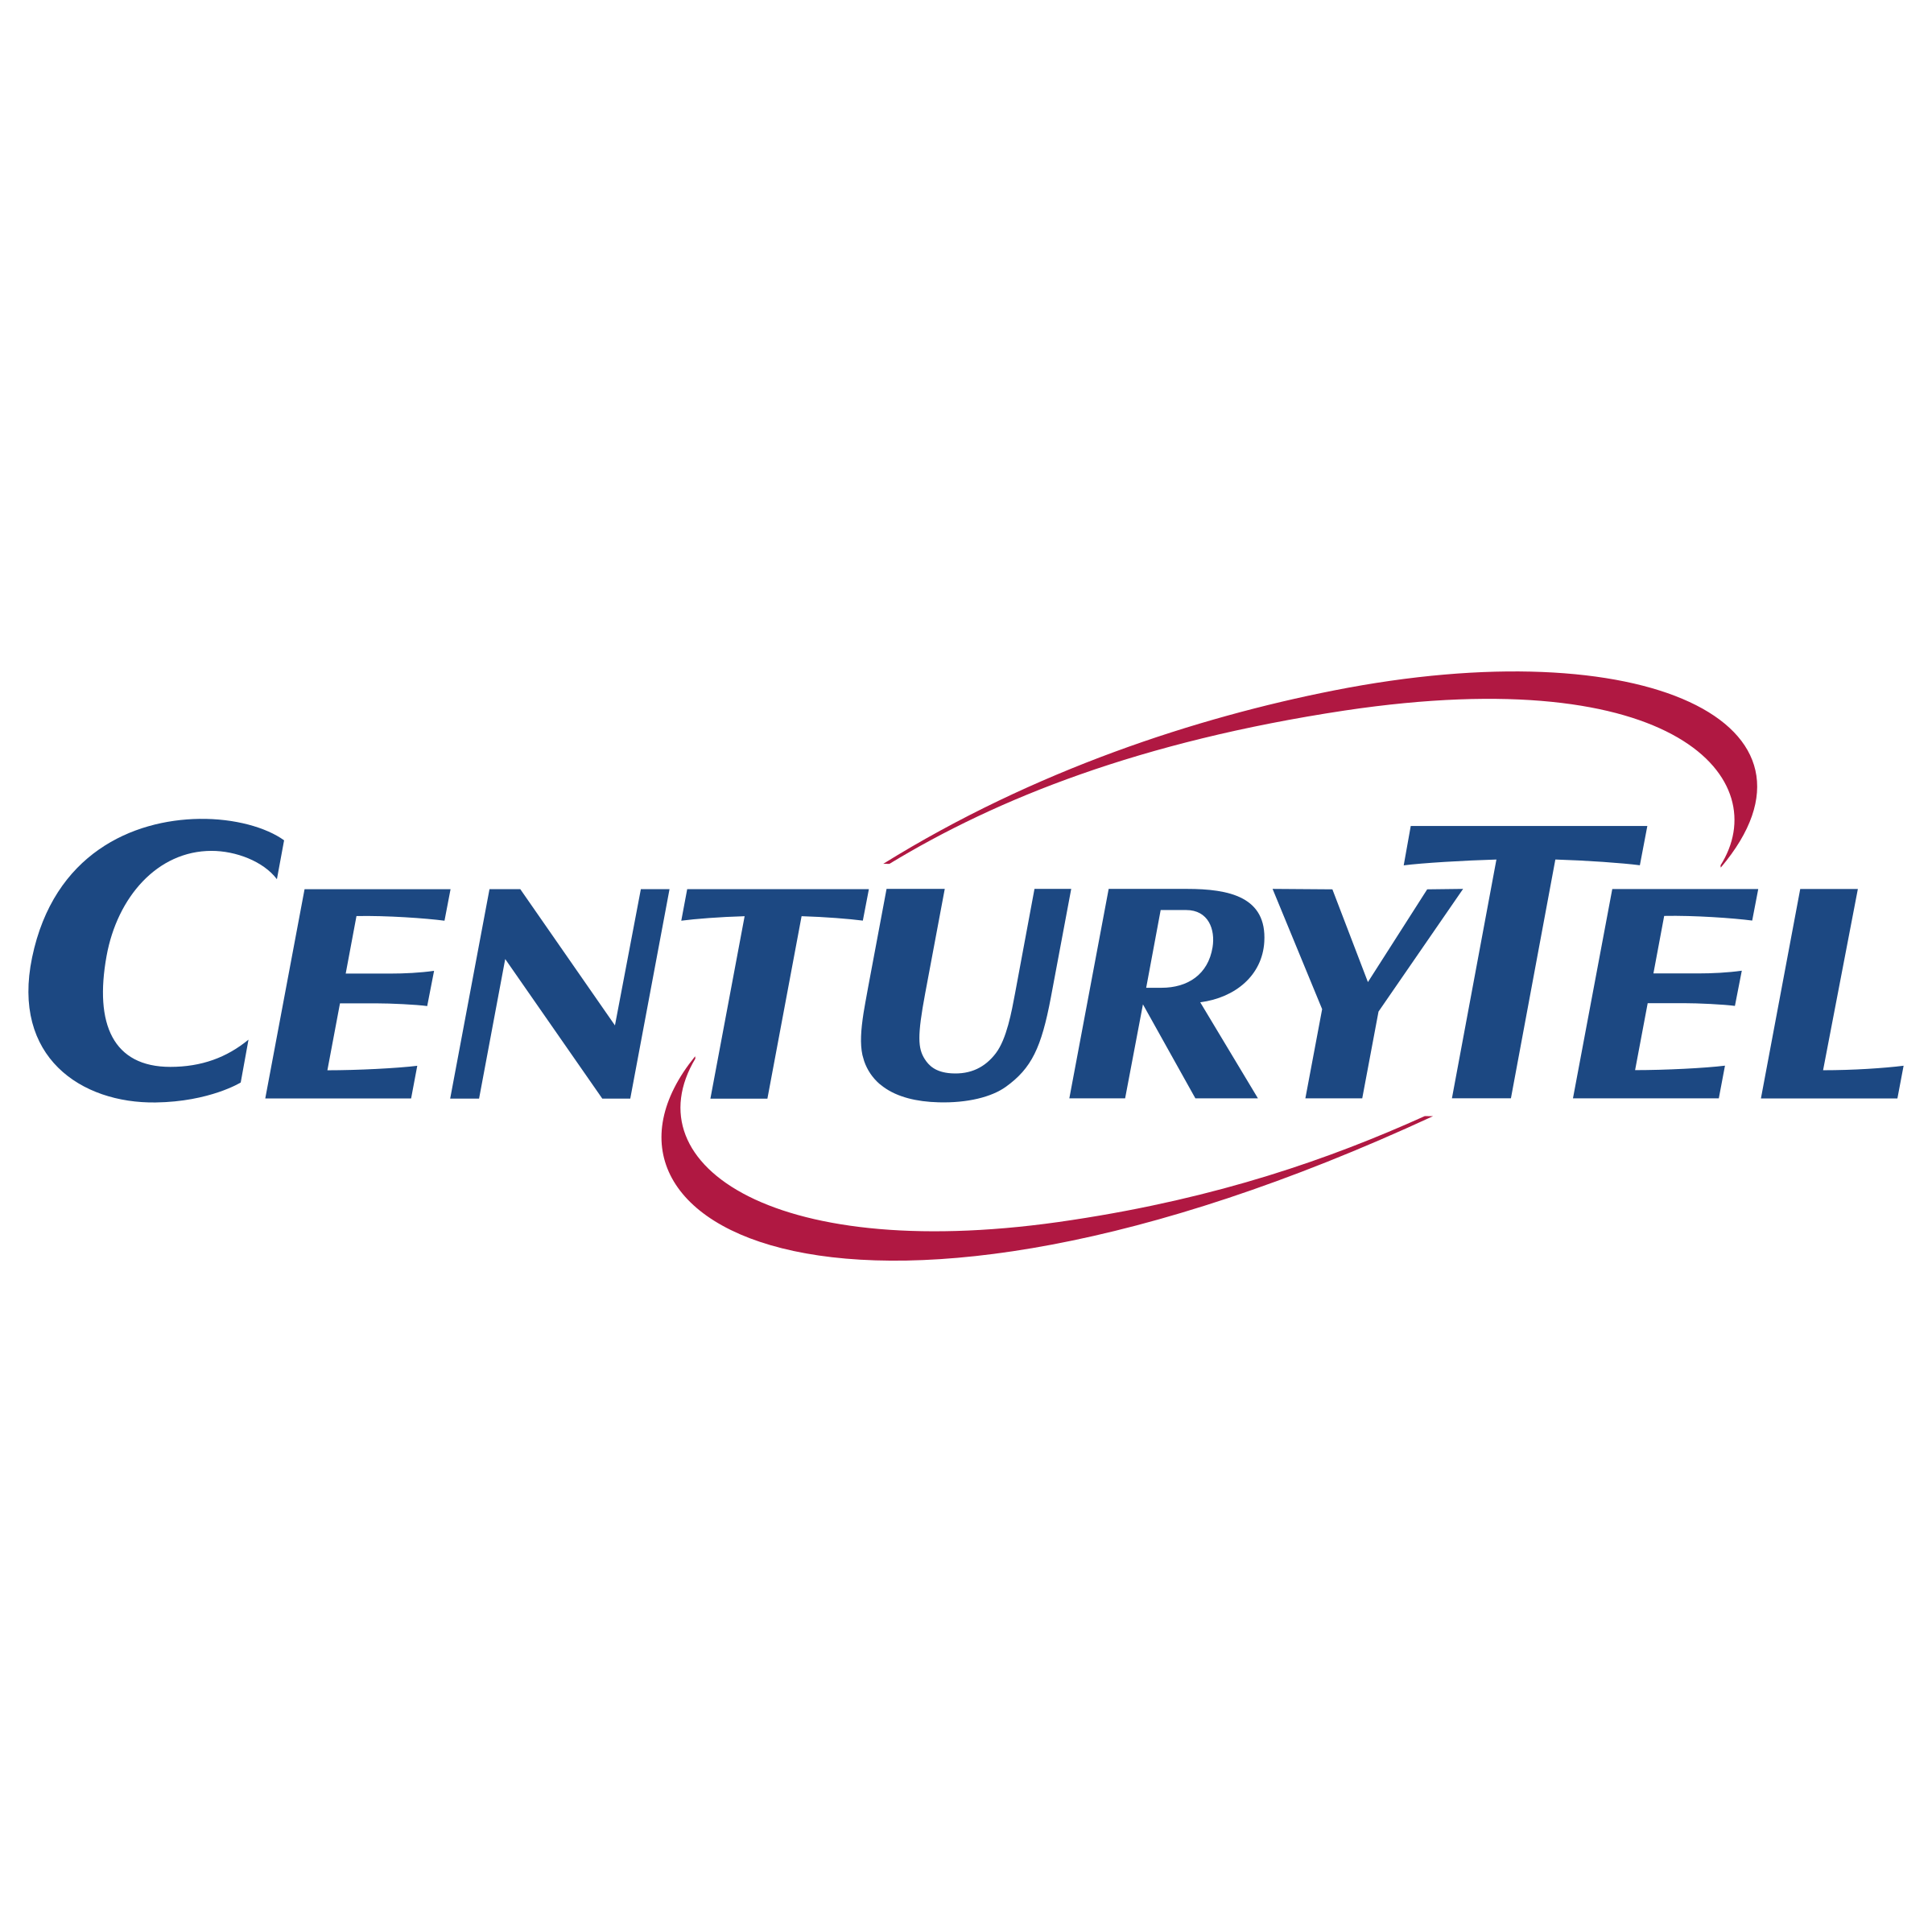 centurytel-logo-png-transparent